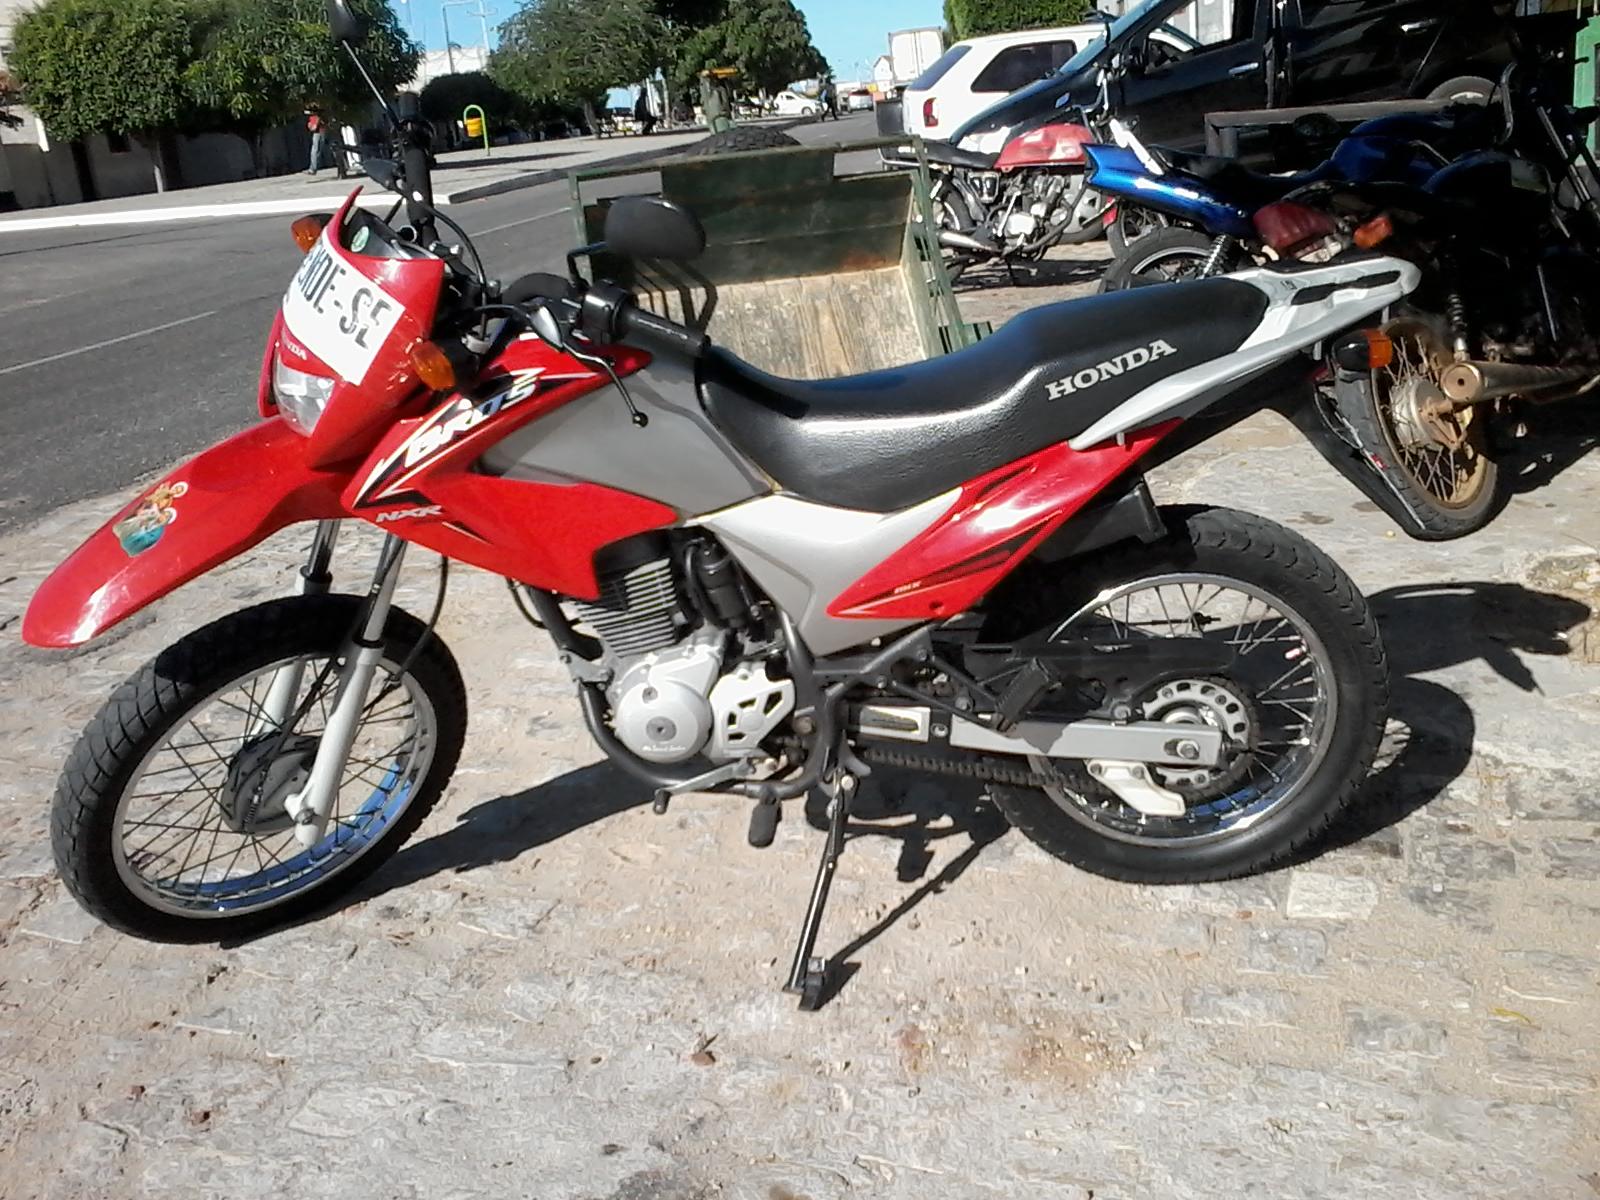 Alto do Rodrigues - Vende-se Moto Honda Bros Ano 2010 Contato (084) 99966 8058 ou 99985 2715